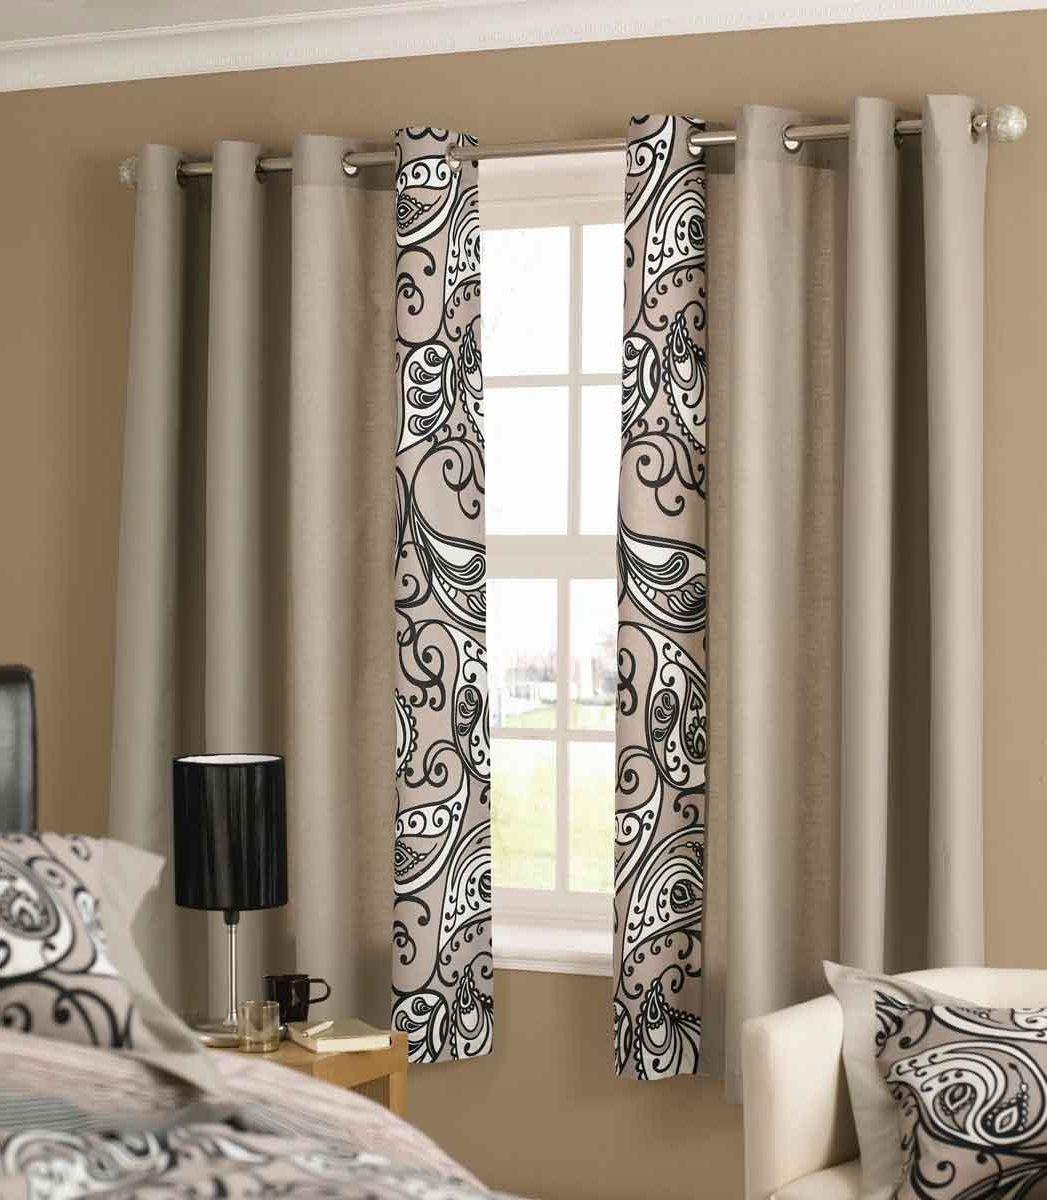 Amazing Bedroom Curtains Ideas Window Curtain Designs Curtain Designs For Bedroom Curtains